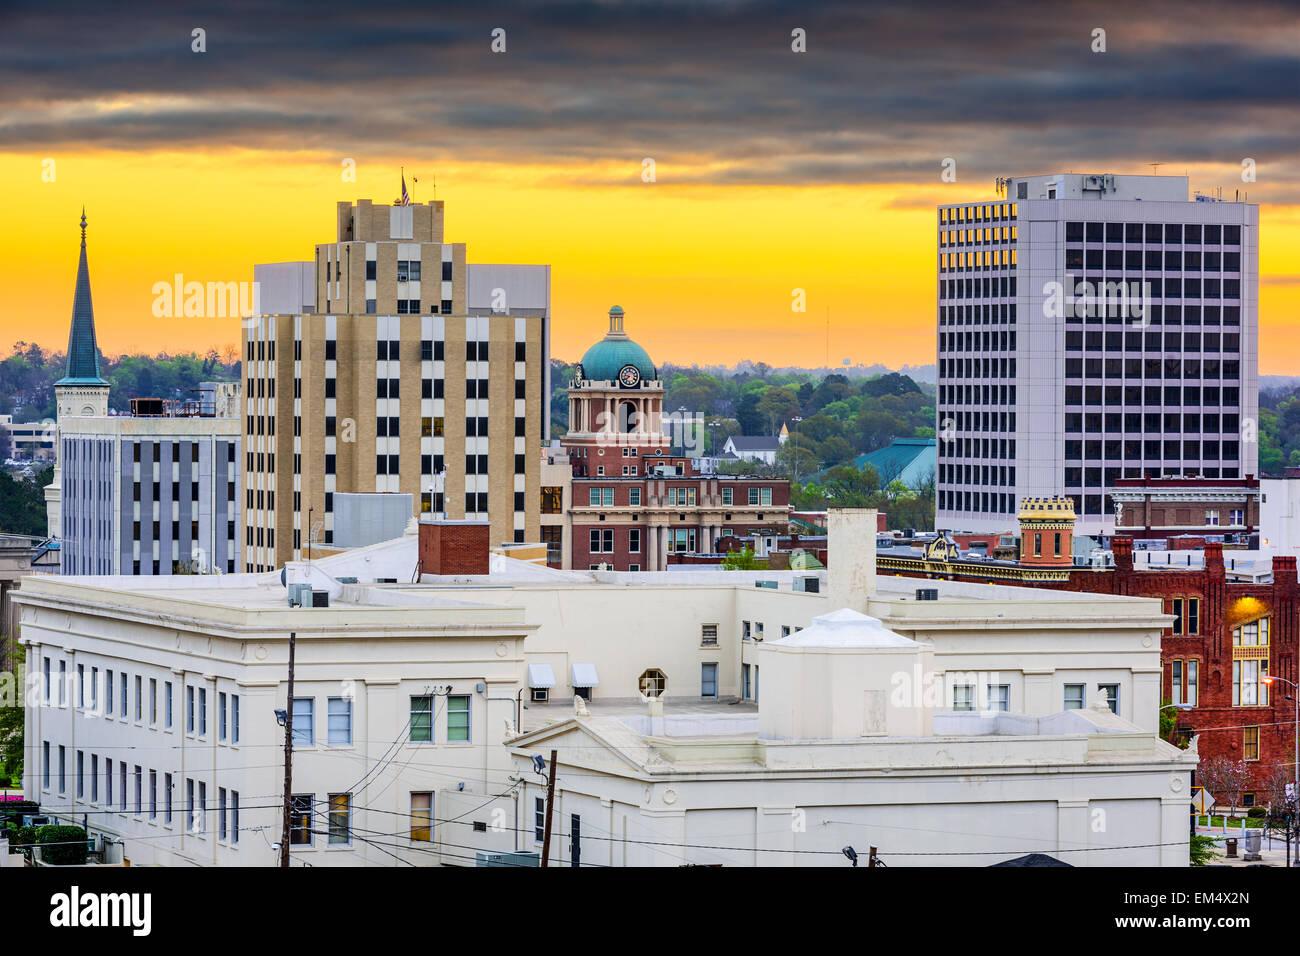 Macon, Georgia, USA downtown cityscape at dawn. - Stock Image